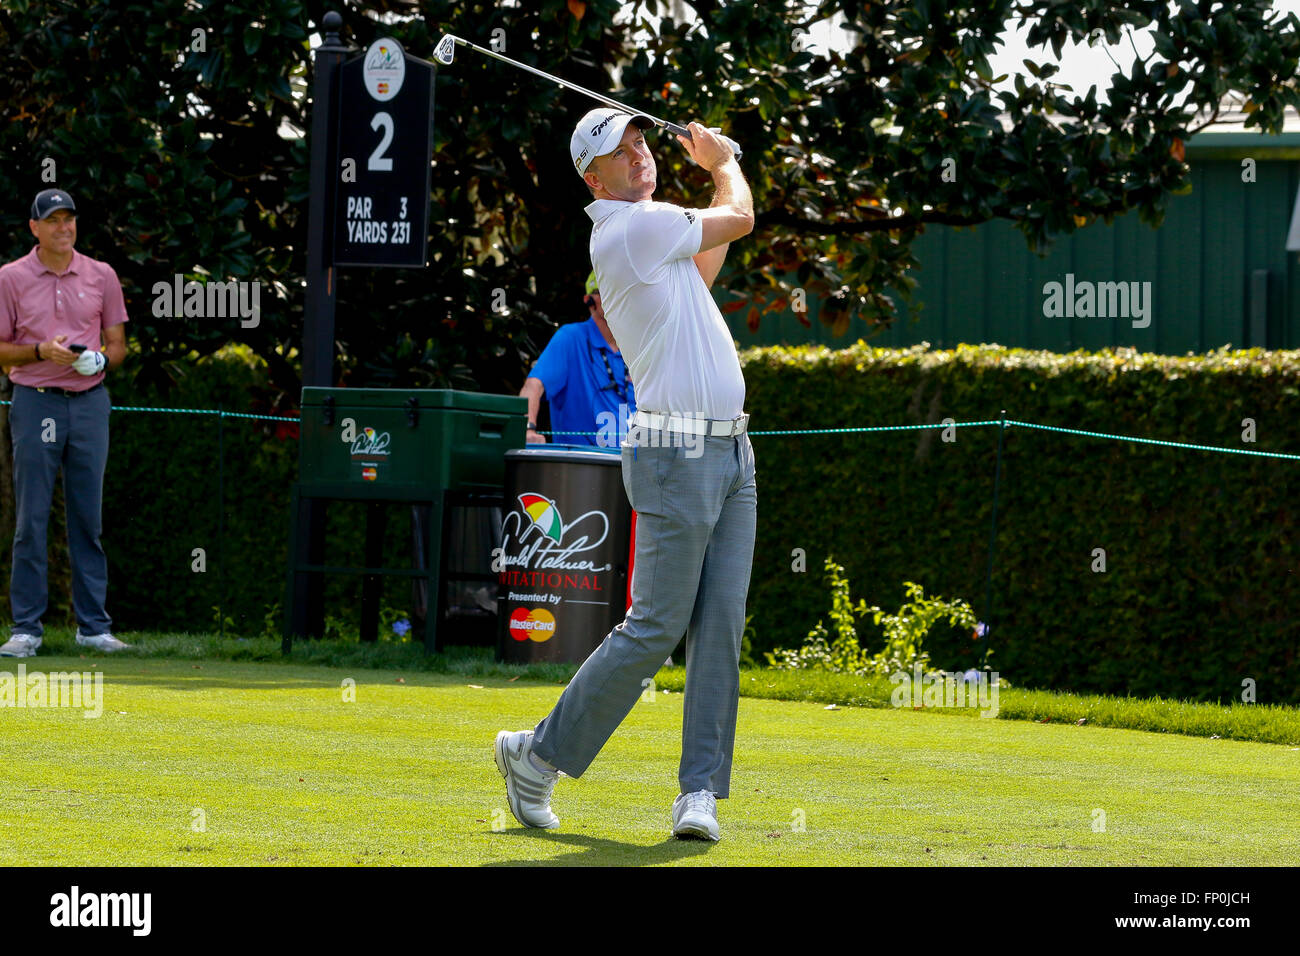 16th March, 2016. Martin Laird, Scottish Golfer, playing at the Arnold Palmer Invitational at Bay Hill Golf Club, Orlando, Florida Credit: Findlay/Alamy ...